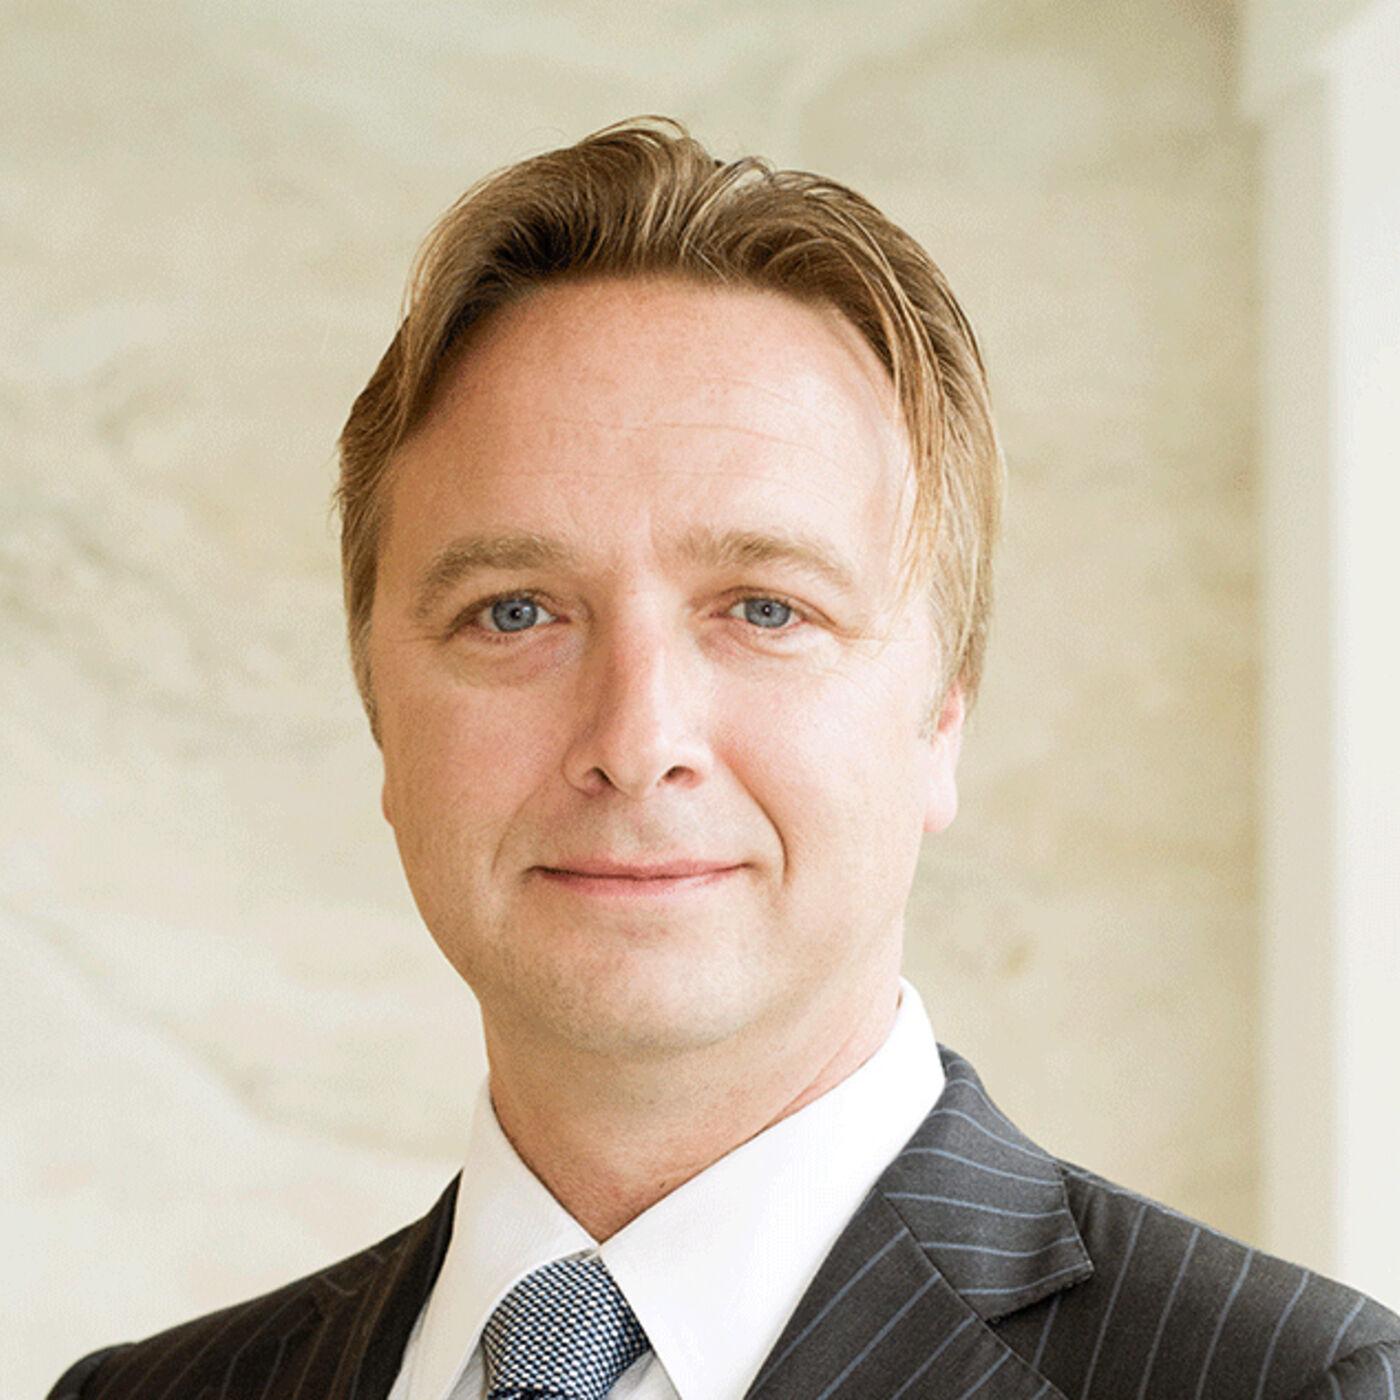 Lance Morginn: Blockchain explained, for businesses, law enforcement and students